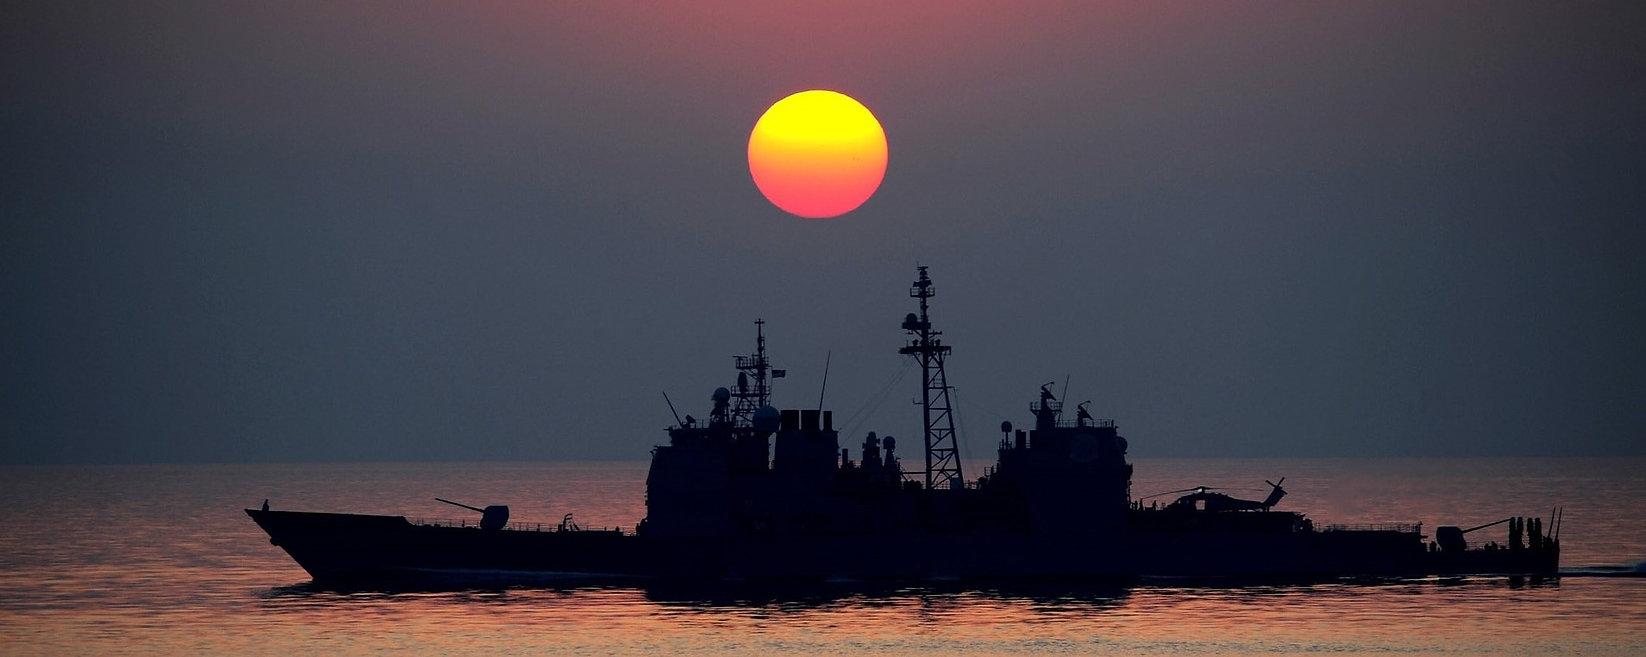 US Navy Ship at Sunset.jpg